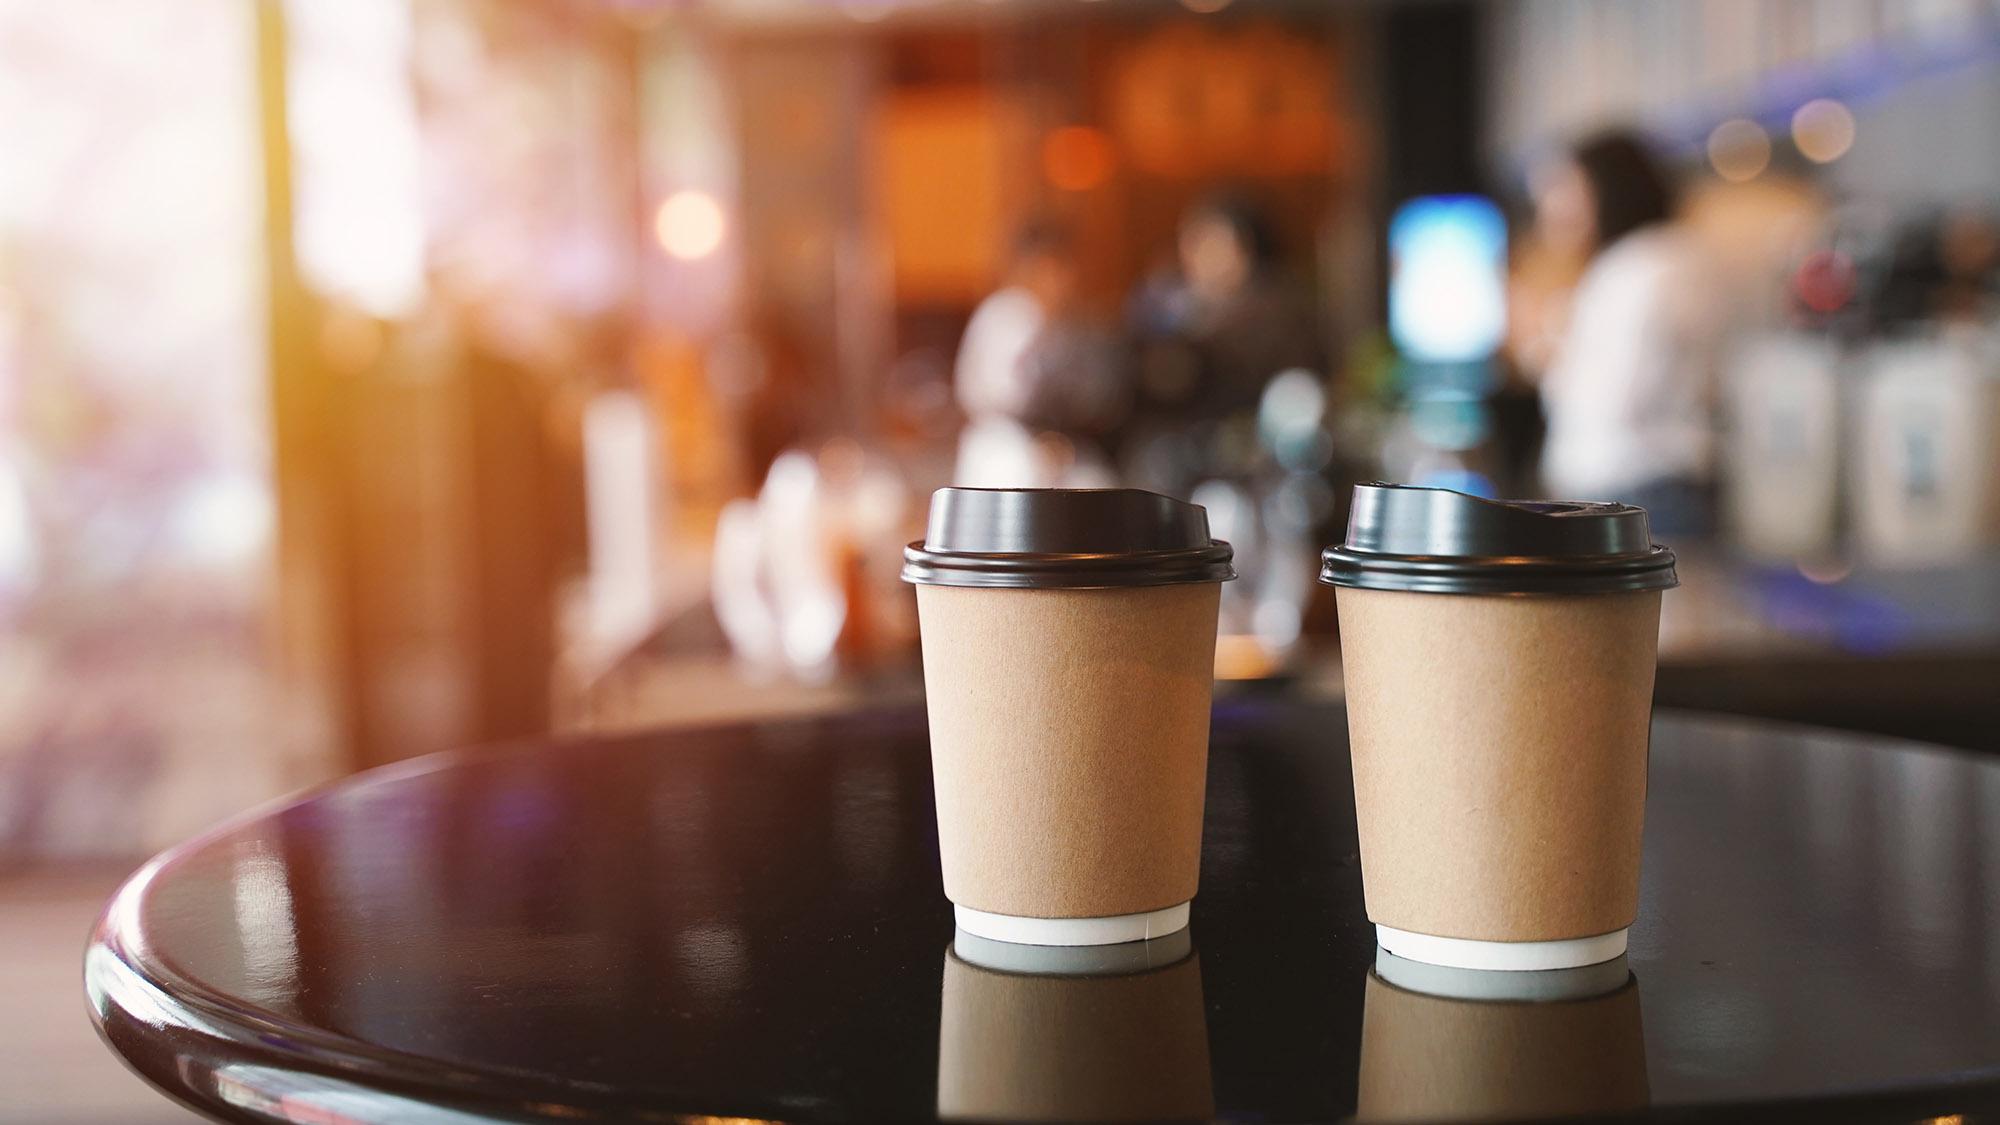 Coffee shop cups 1077720060 UK CW